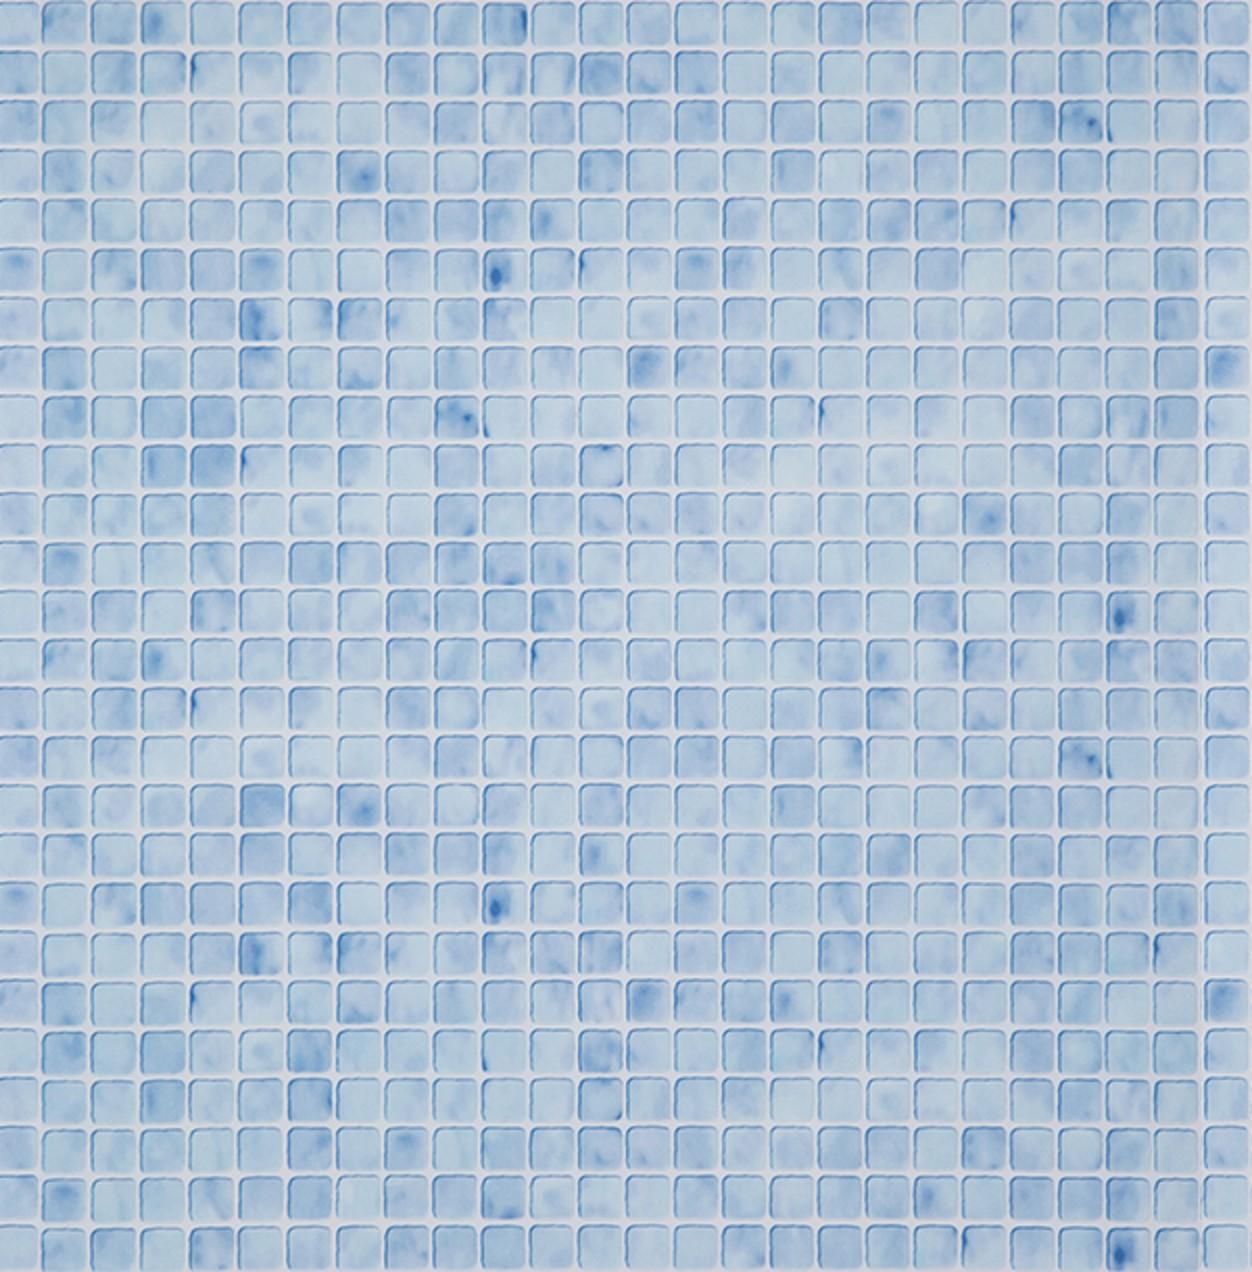 Tapeta na stěnu Vavex 261 | 0,53 x 10,05 m (Vinylová tapeta - modrá)